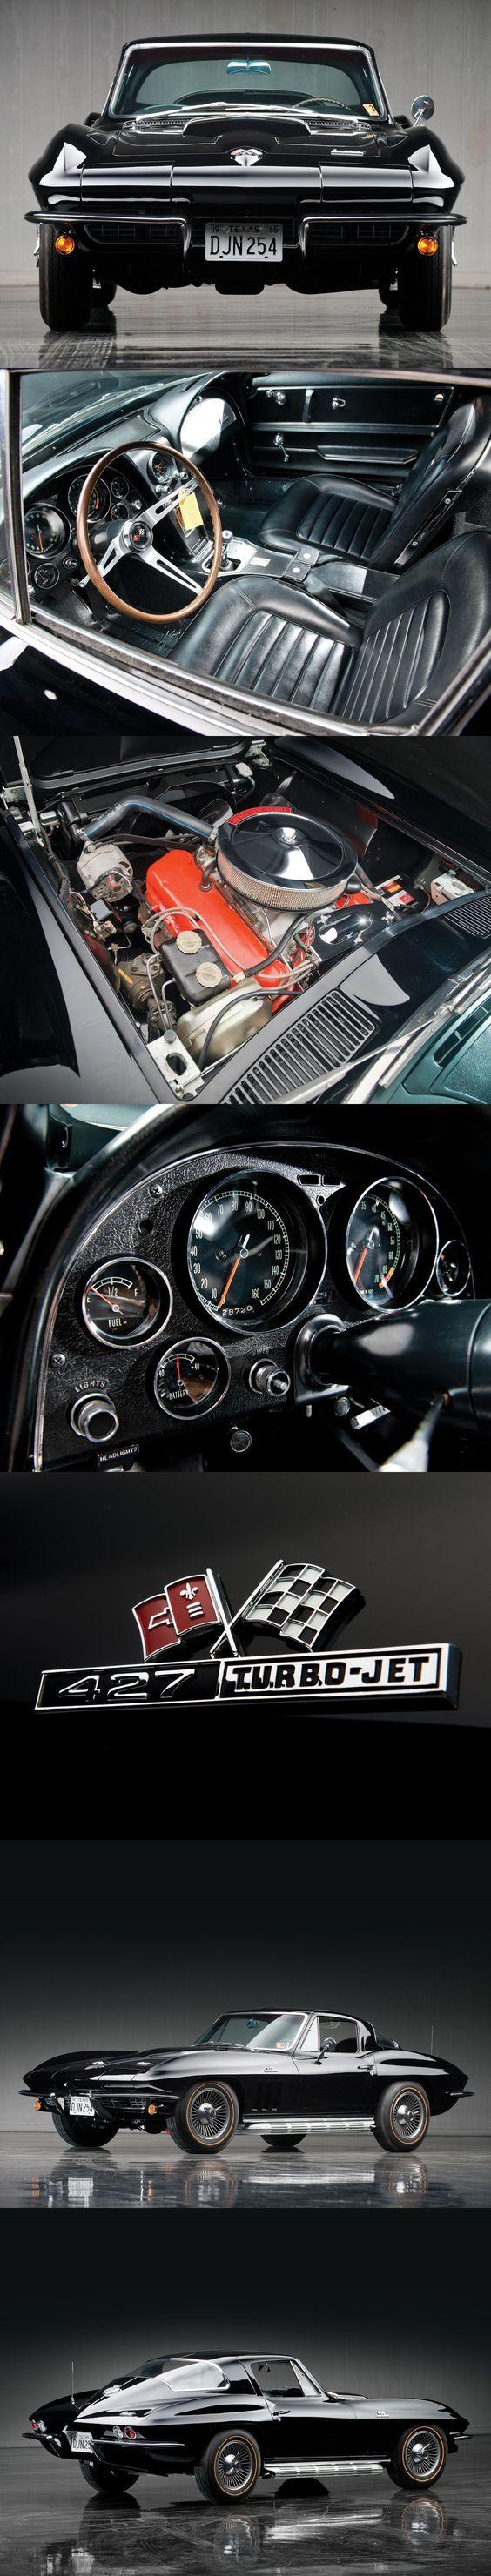 1966 Chevrolet Corvette Sting Ray Coupe: